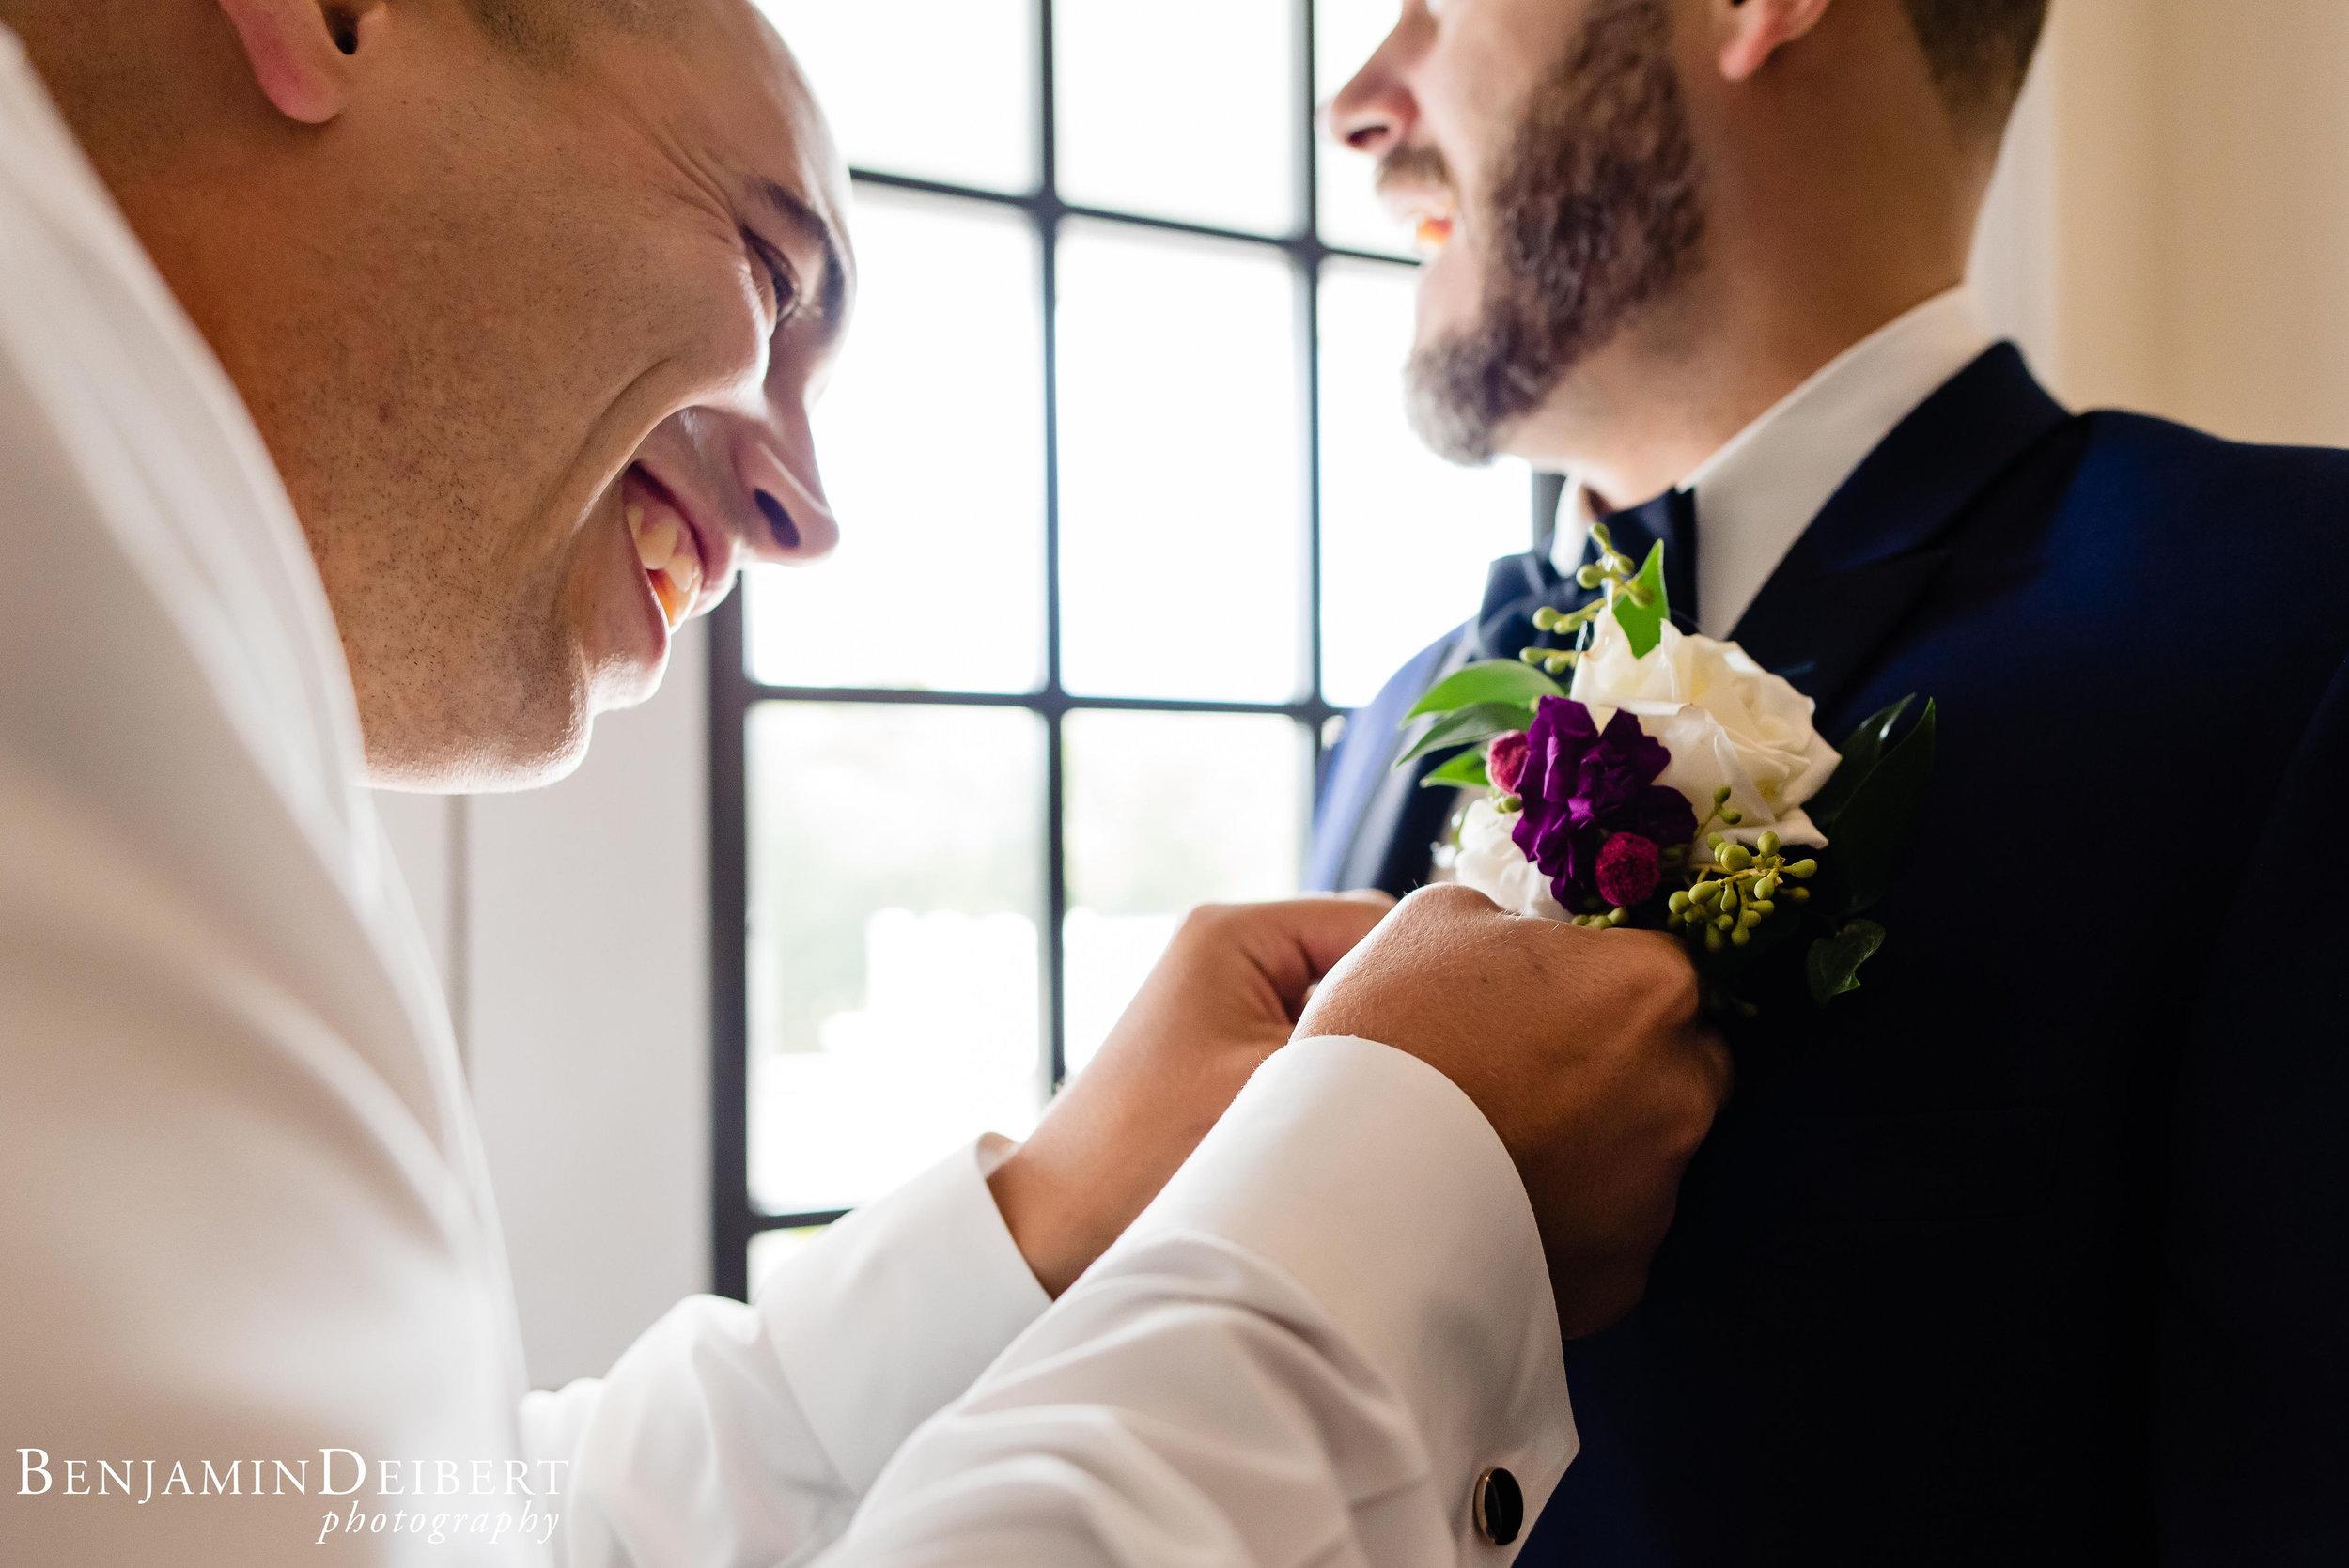 AmandaandElliott_TheCarriageHouse_Wedding-9.jpg